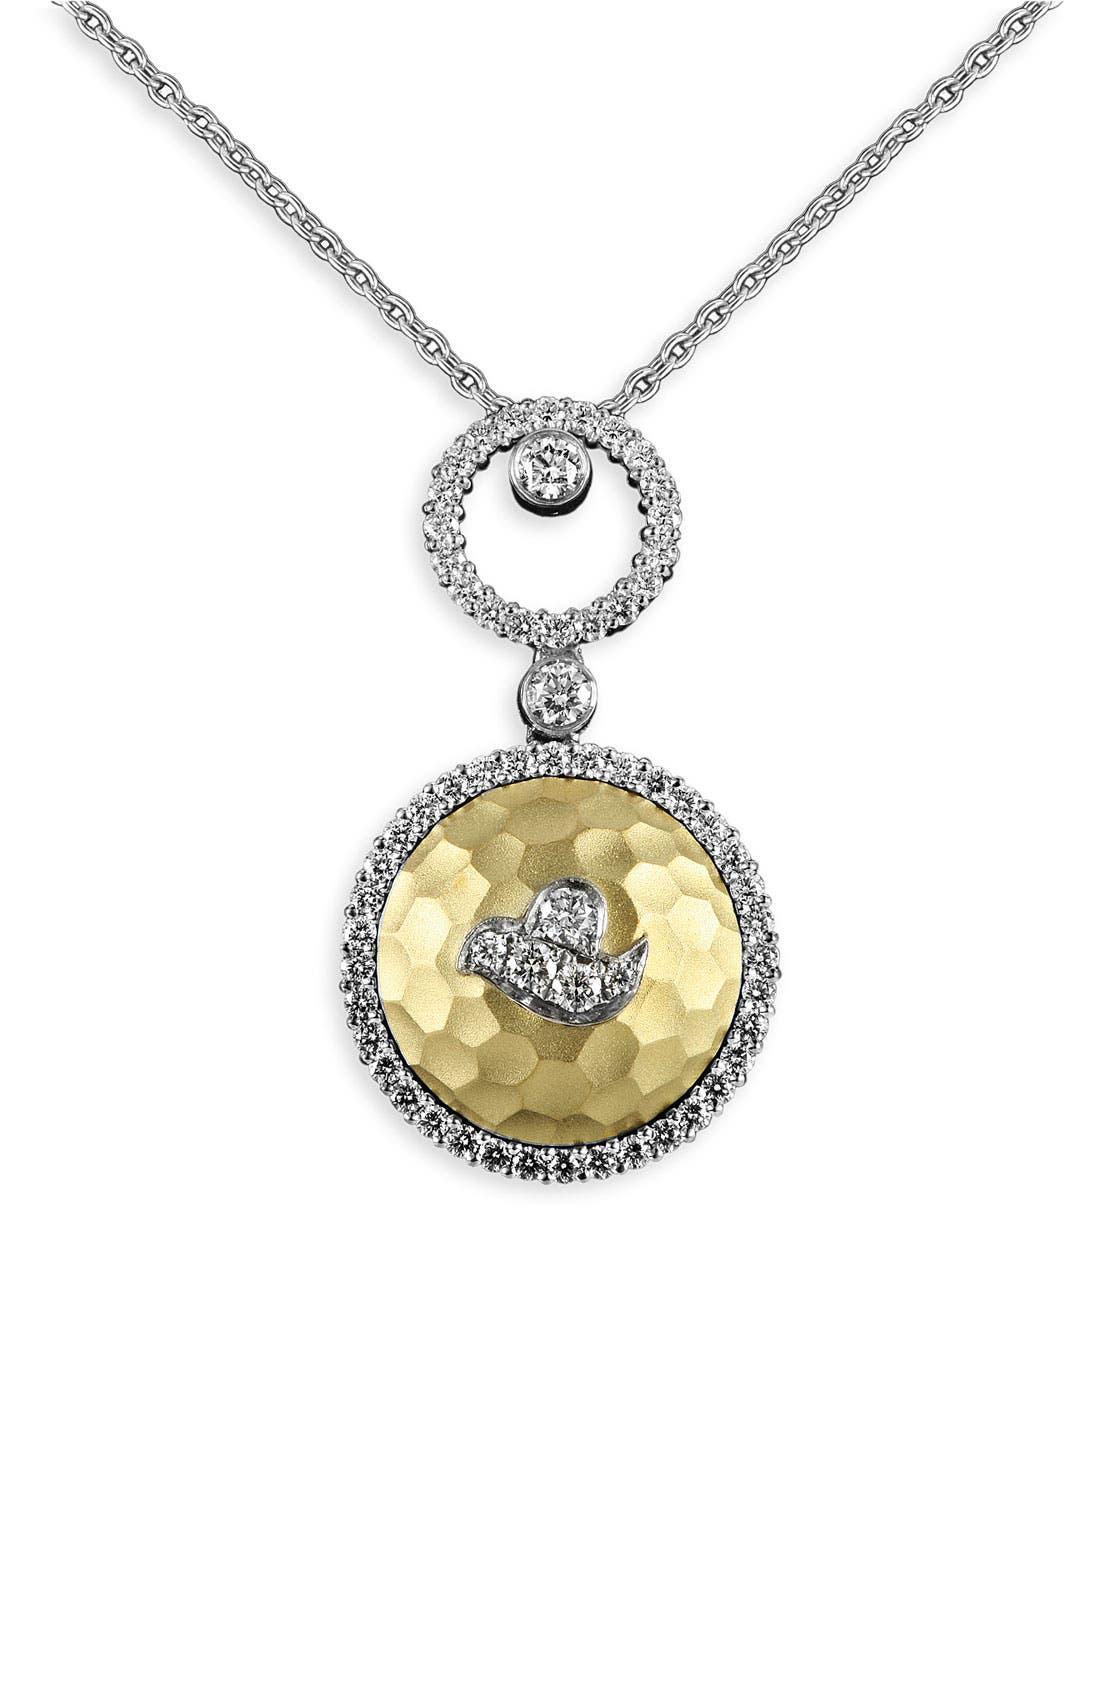 Main Image - Jack Kelége 'Byzantine' Double Drop Diamond Pendant Necklace